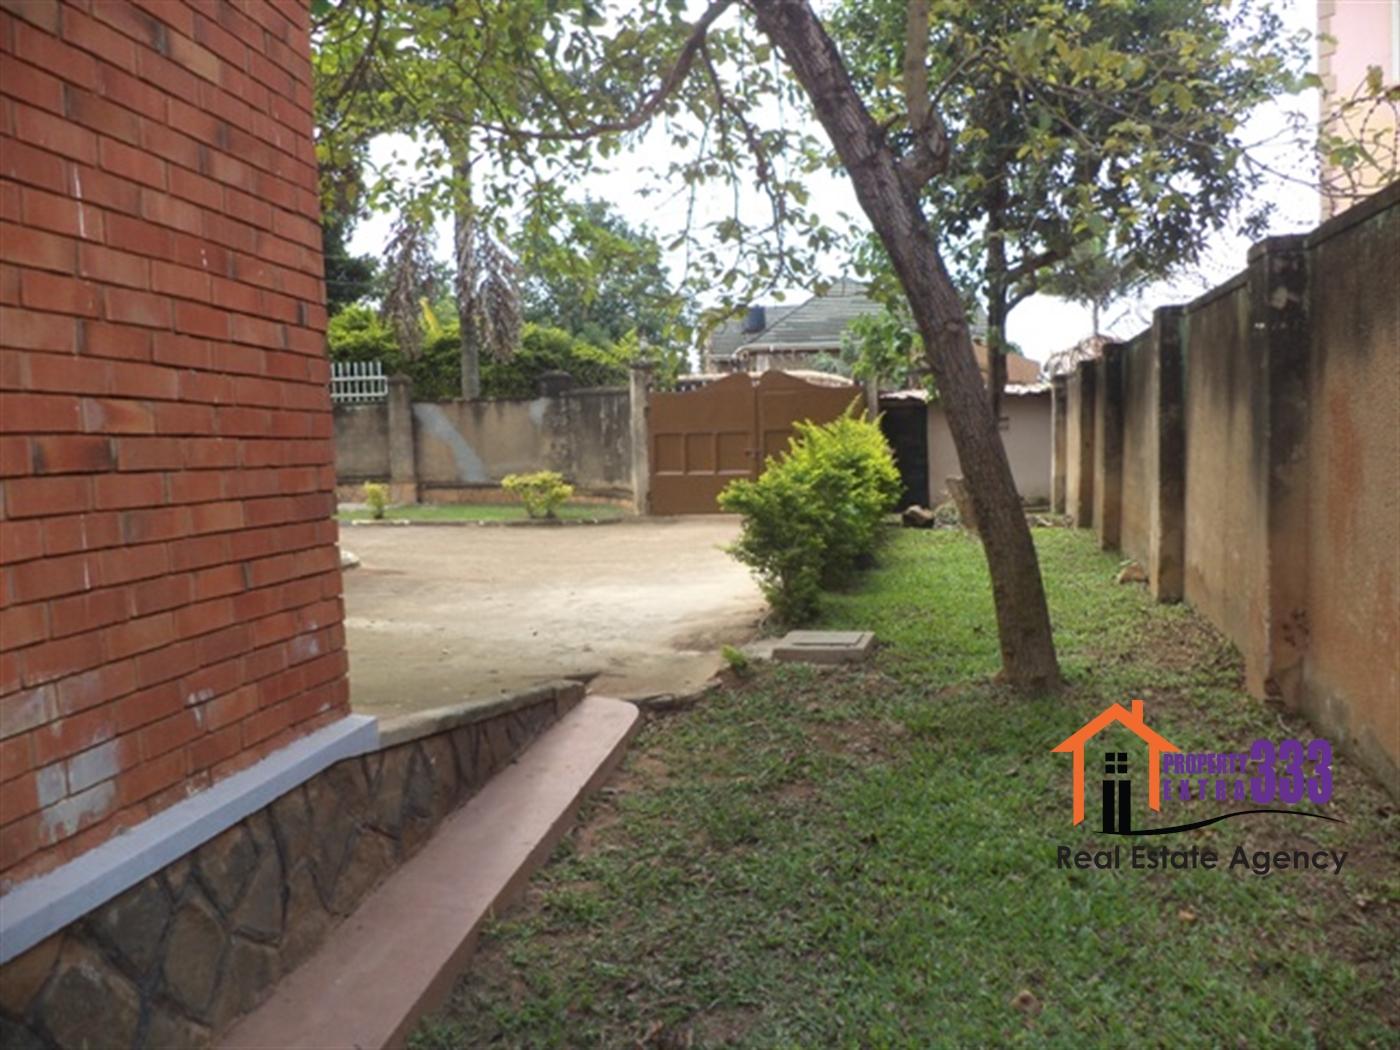 Bungalow for rent in Kiwatule Kampala